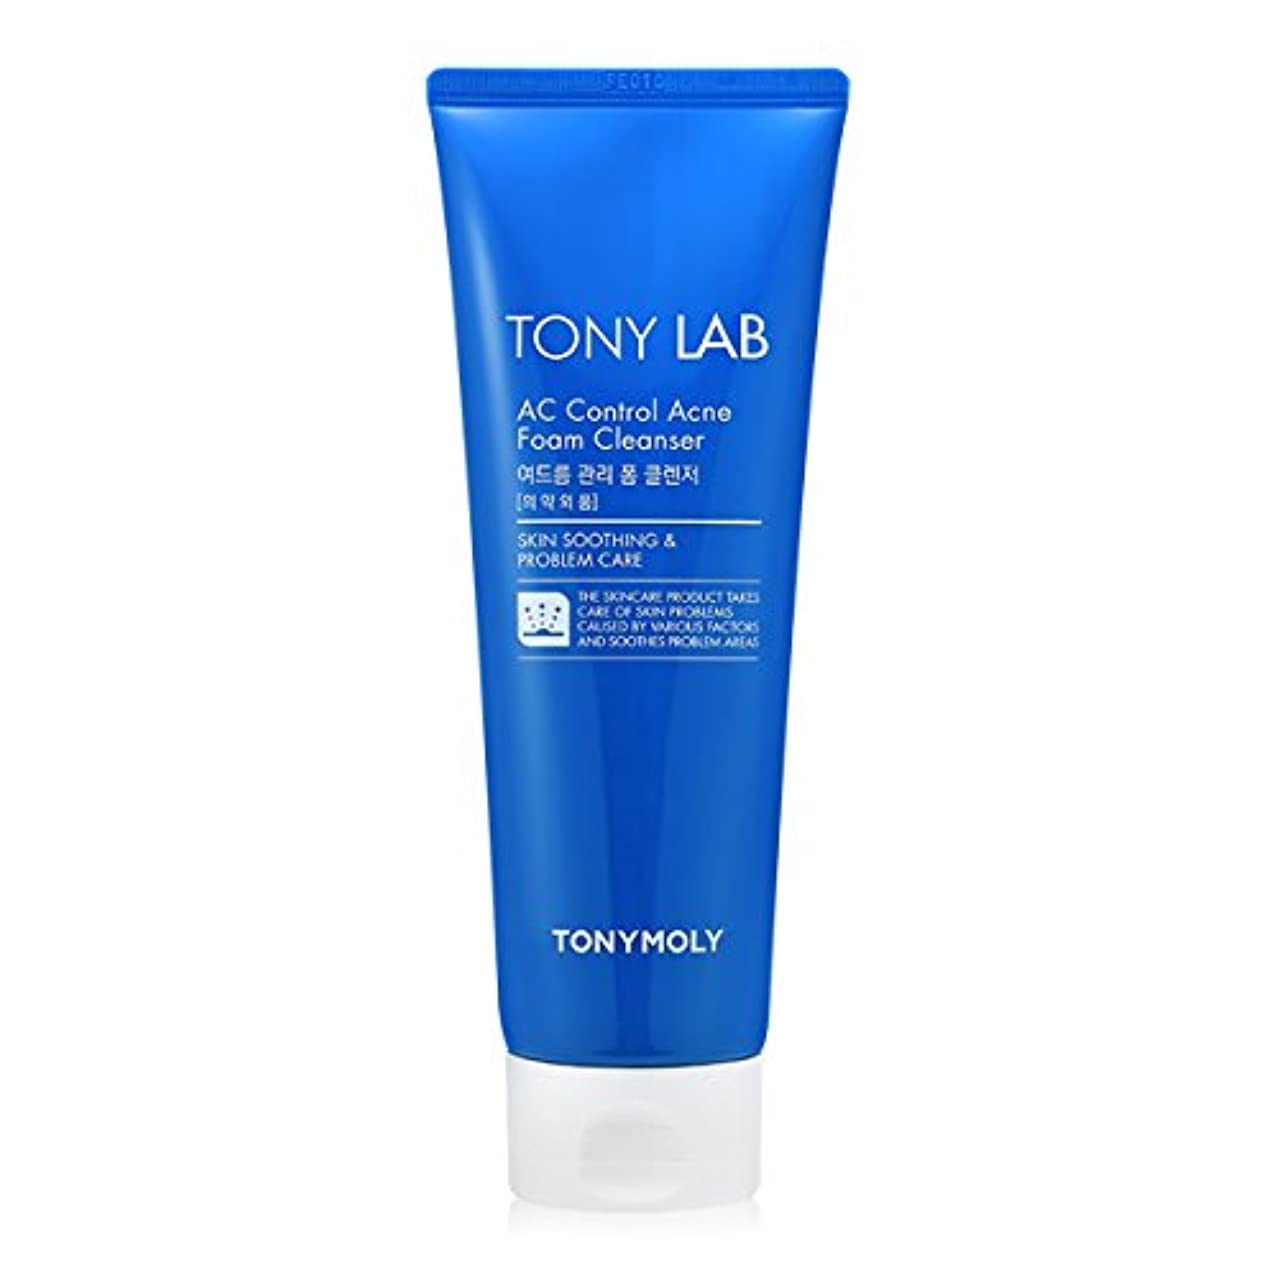 [New] TONYMOLY Tony Lab AC Control Acne Foam Cleanser 150ml/トニーモリー トニー ラボ AC コントロール アクネ フォーム クレンザー 150ml